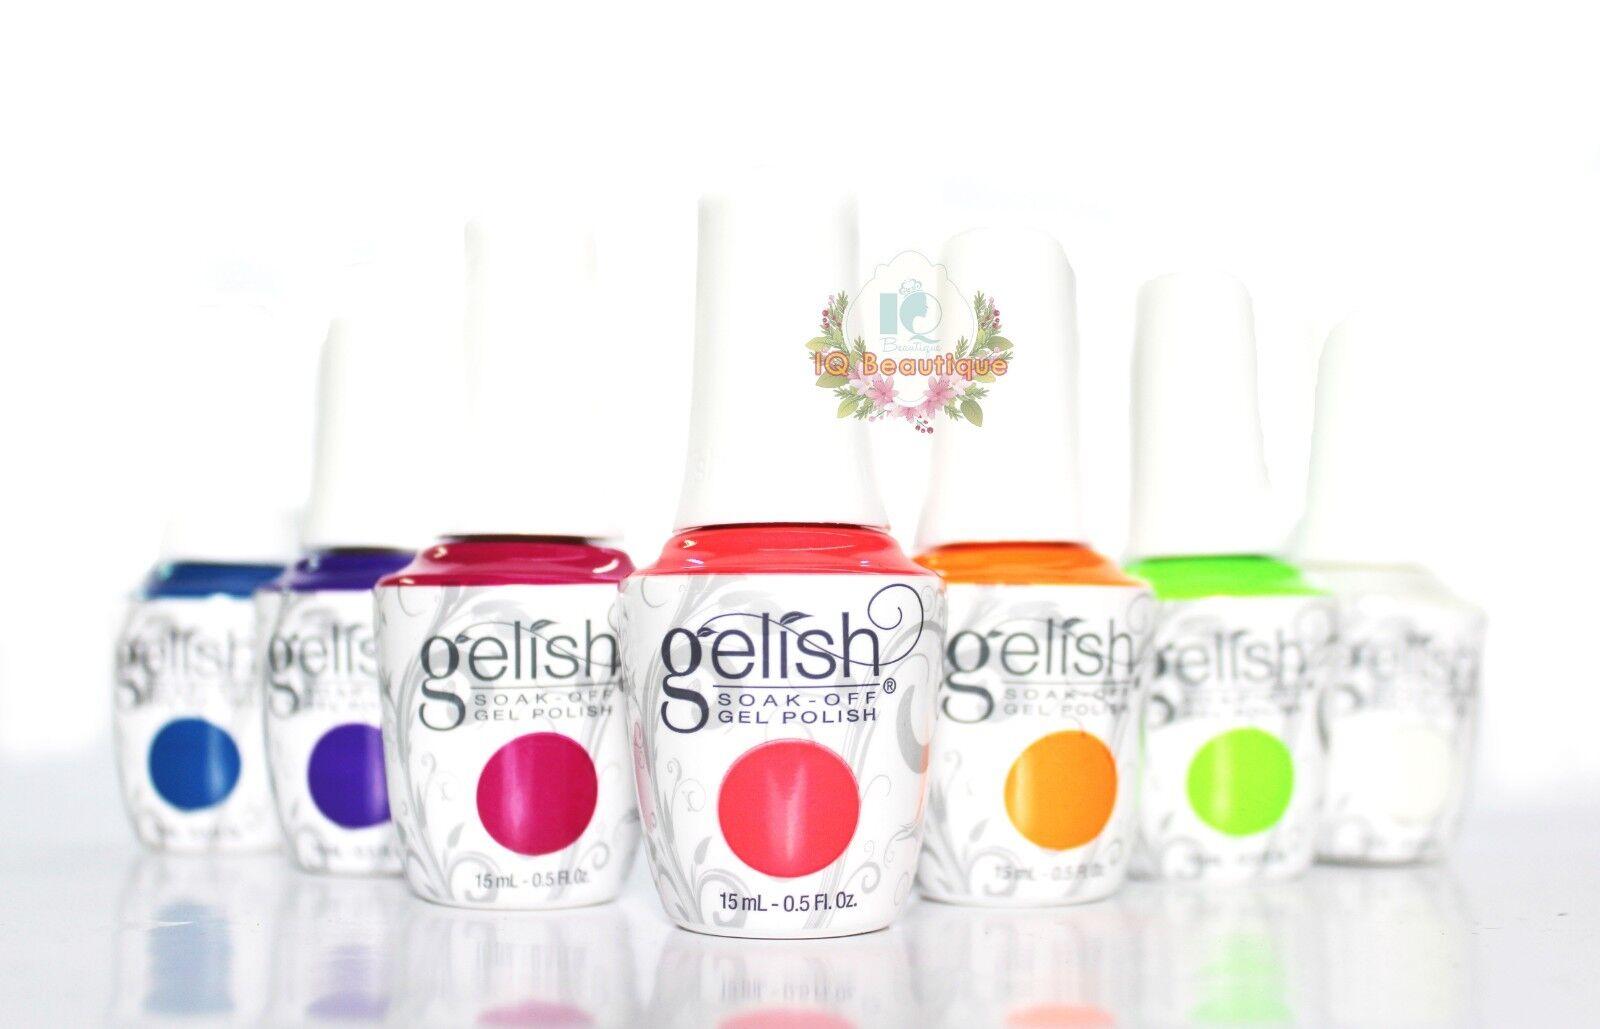 Harmony Gelish Soak-Off Gel Polish NEW BOTTLE!